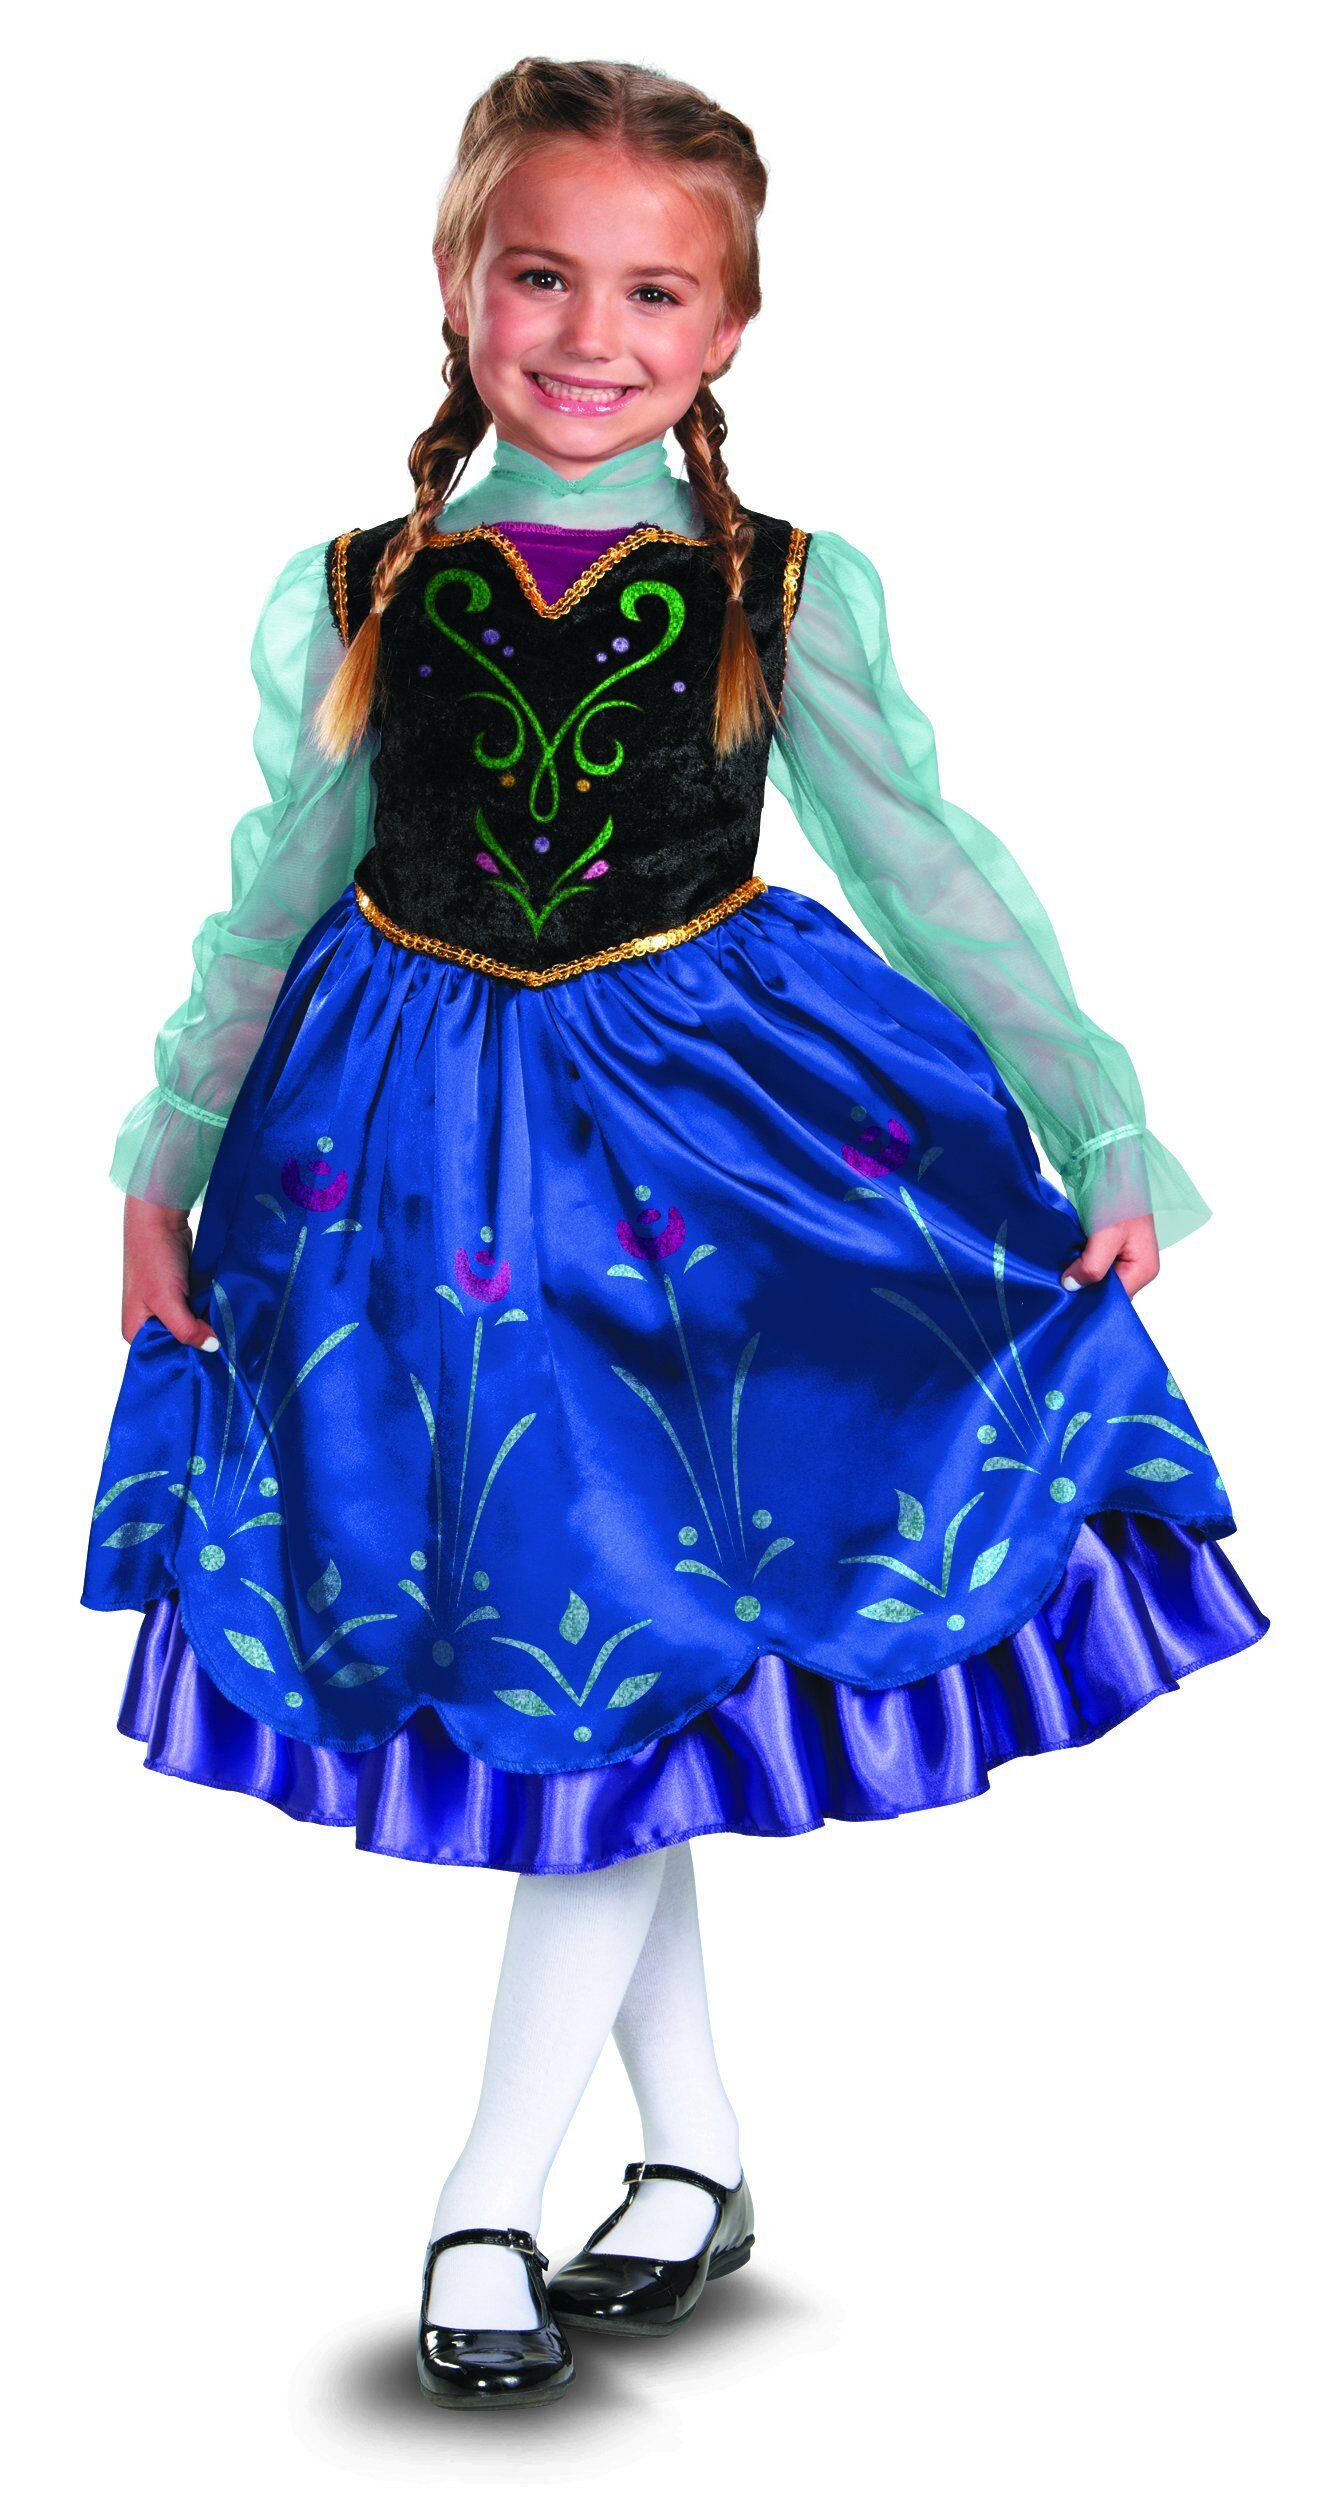 b518f450a04c Elsa Frozen Kids Costume   FJK Costume Hole And A Child Costume Play ...